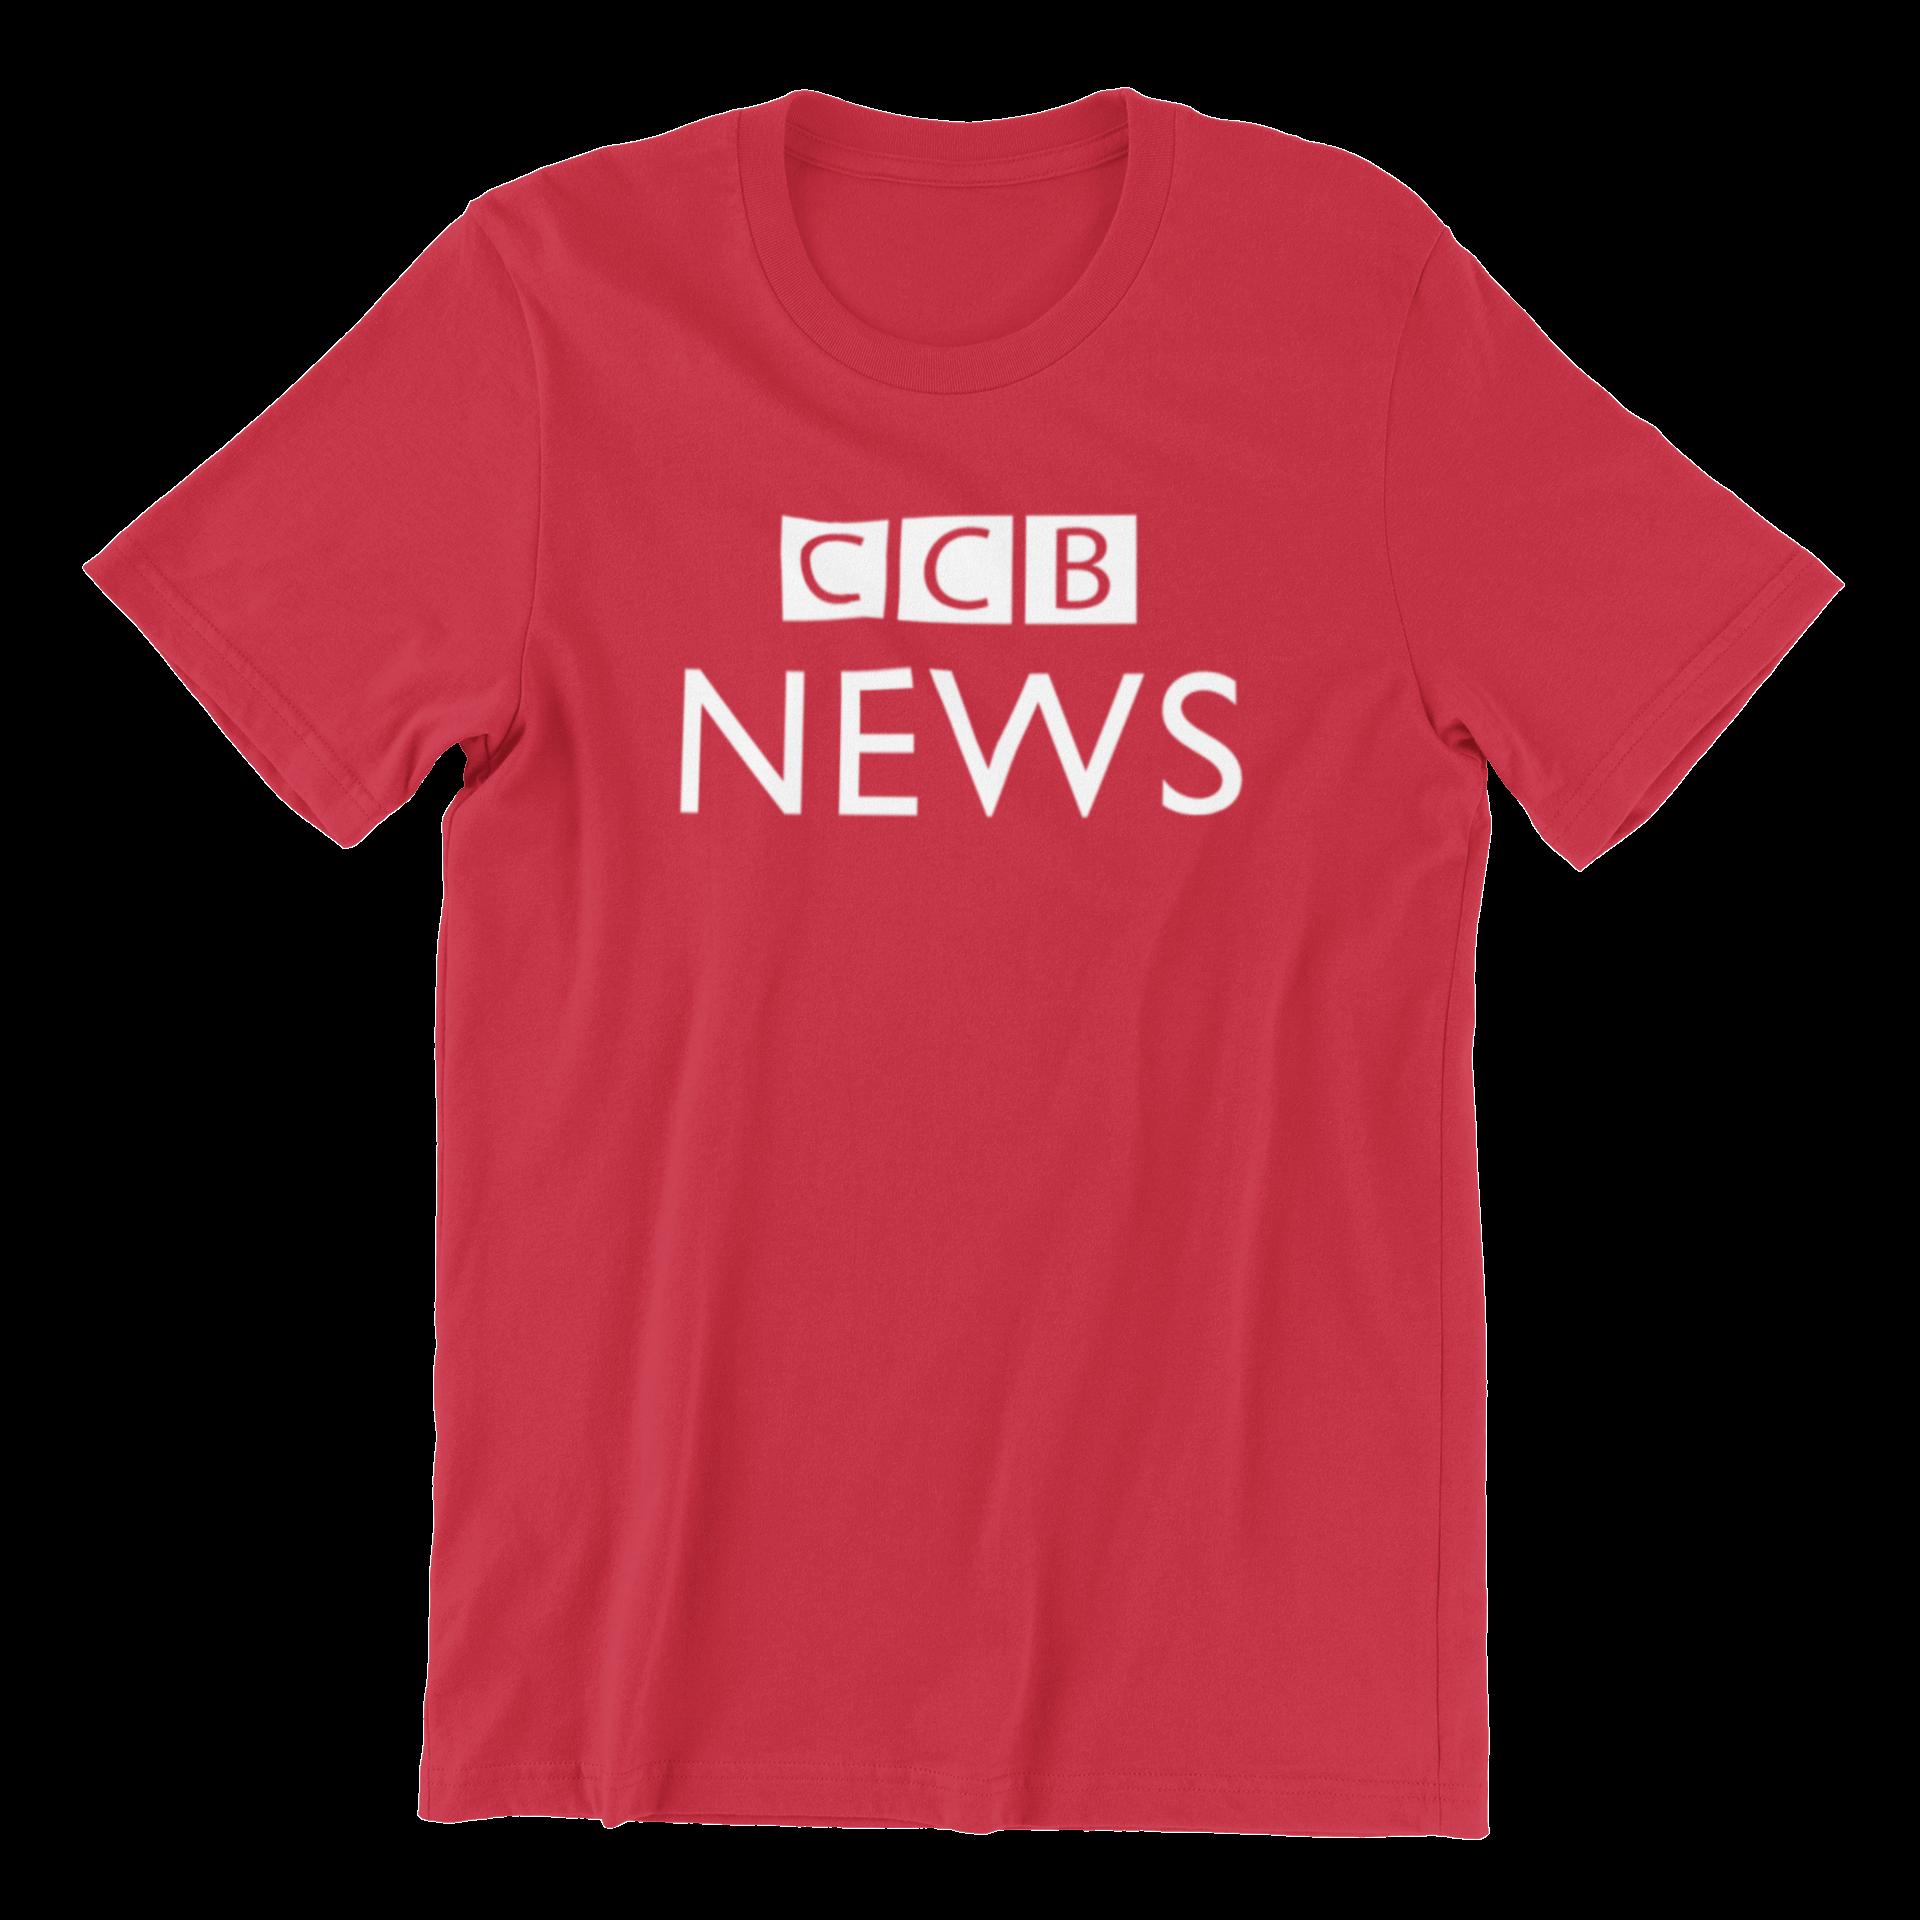 CCB News Crew Neck S-Sleeve T-shirt